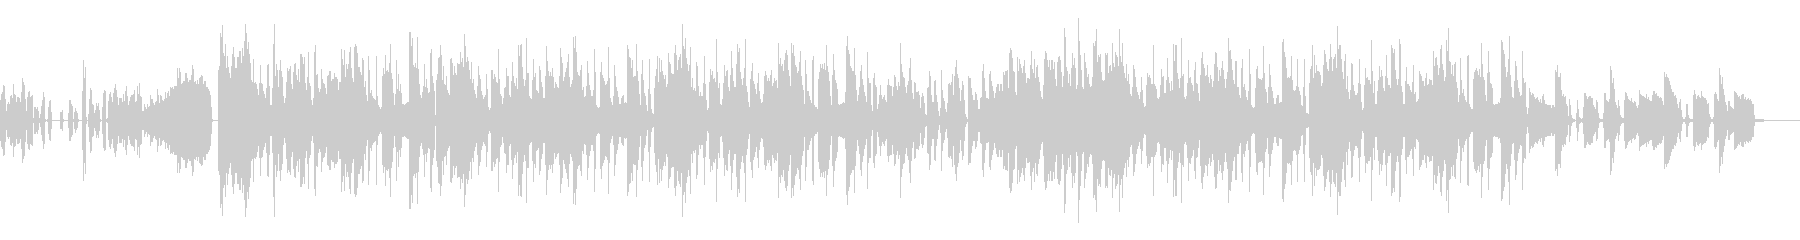 FUNK系ダンサンブルなポップスの未再生の波形